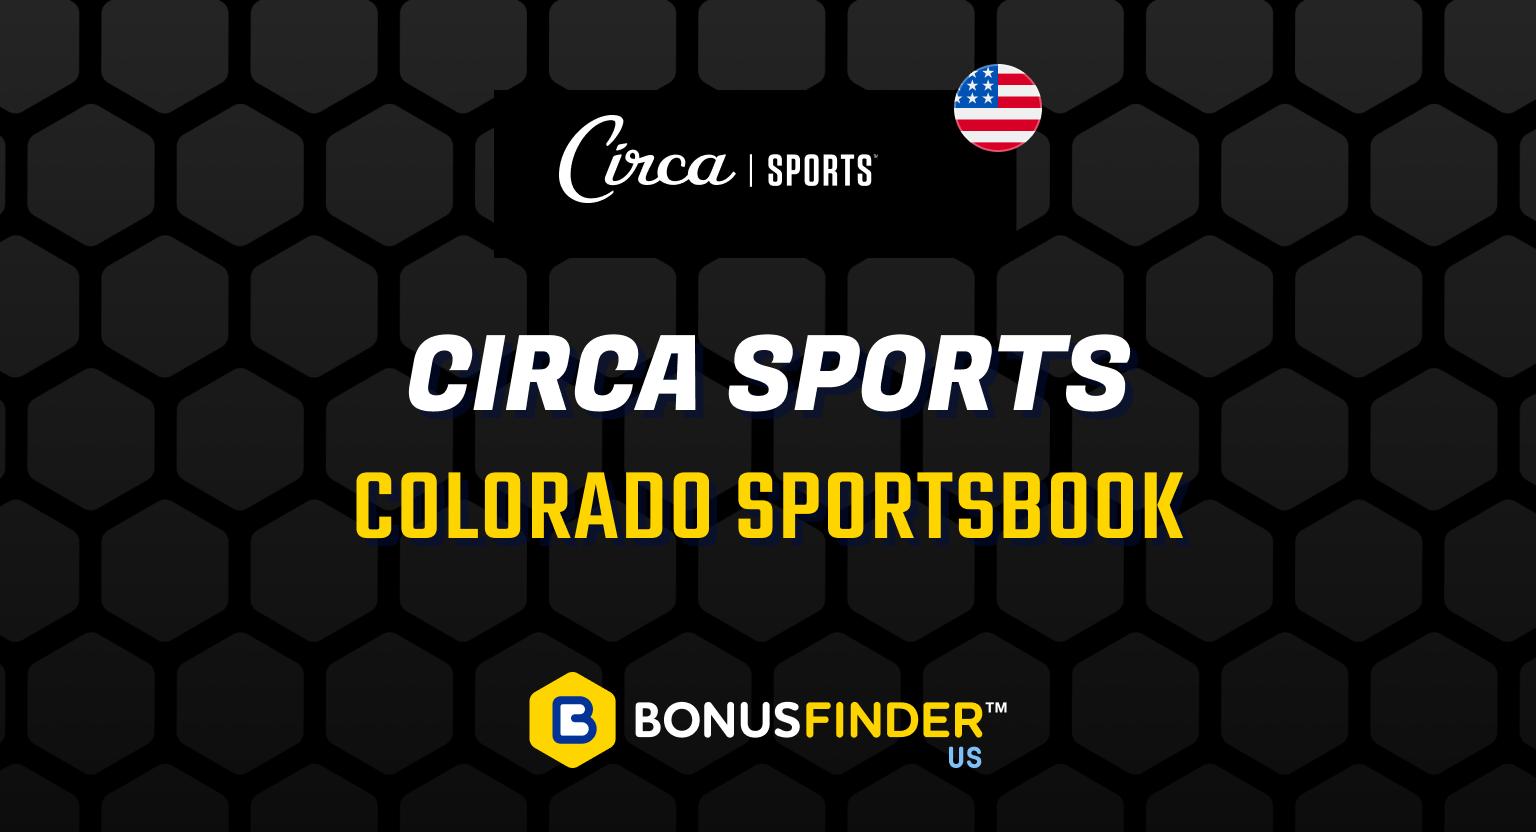 Circa Sports Sportsbook